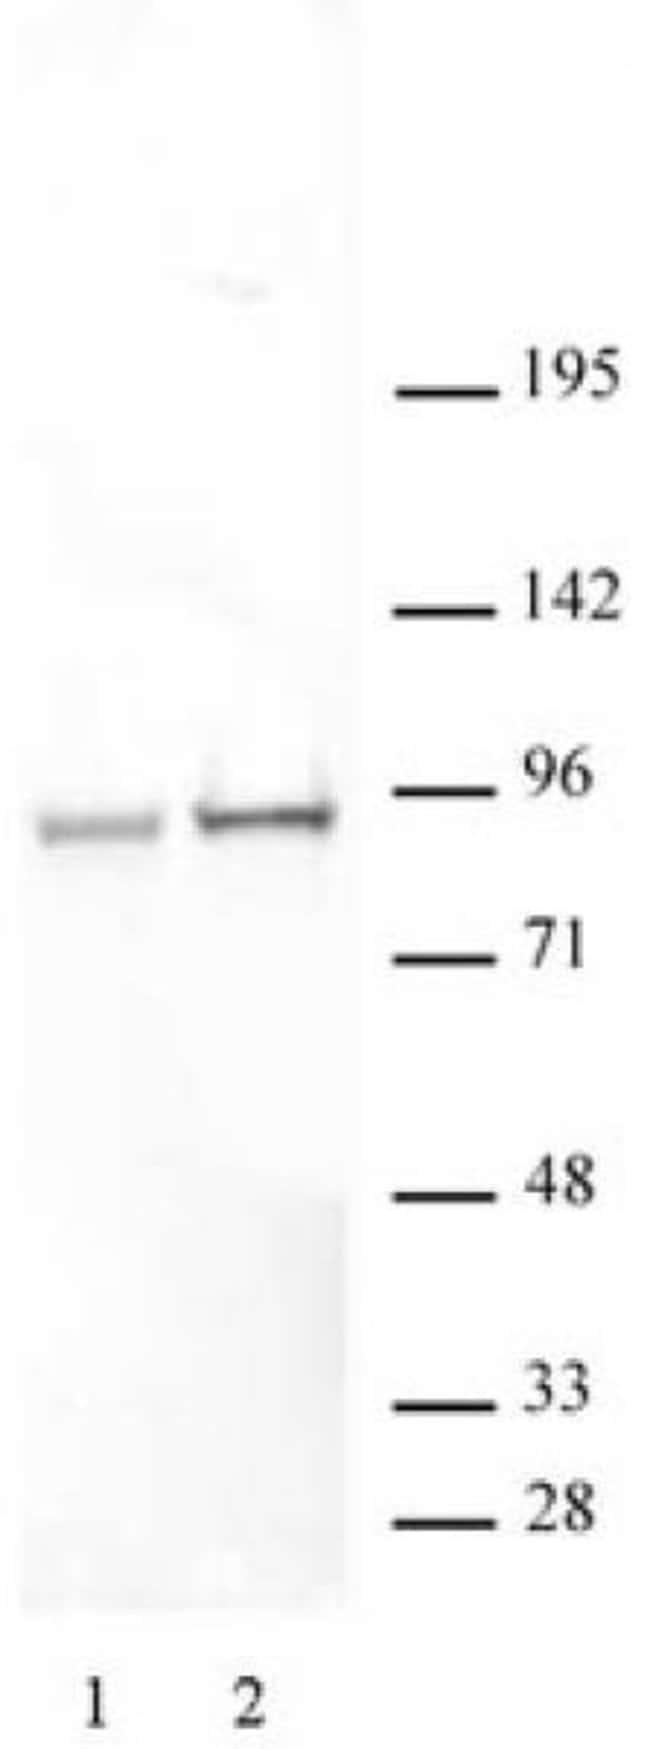 Phospho-STAT5A/B (Ser726, Ser731) Rabbit anti-Human, Unconjugated, Polyclonal,